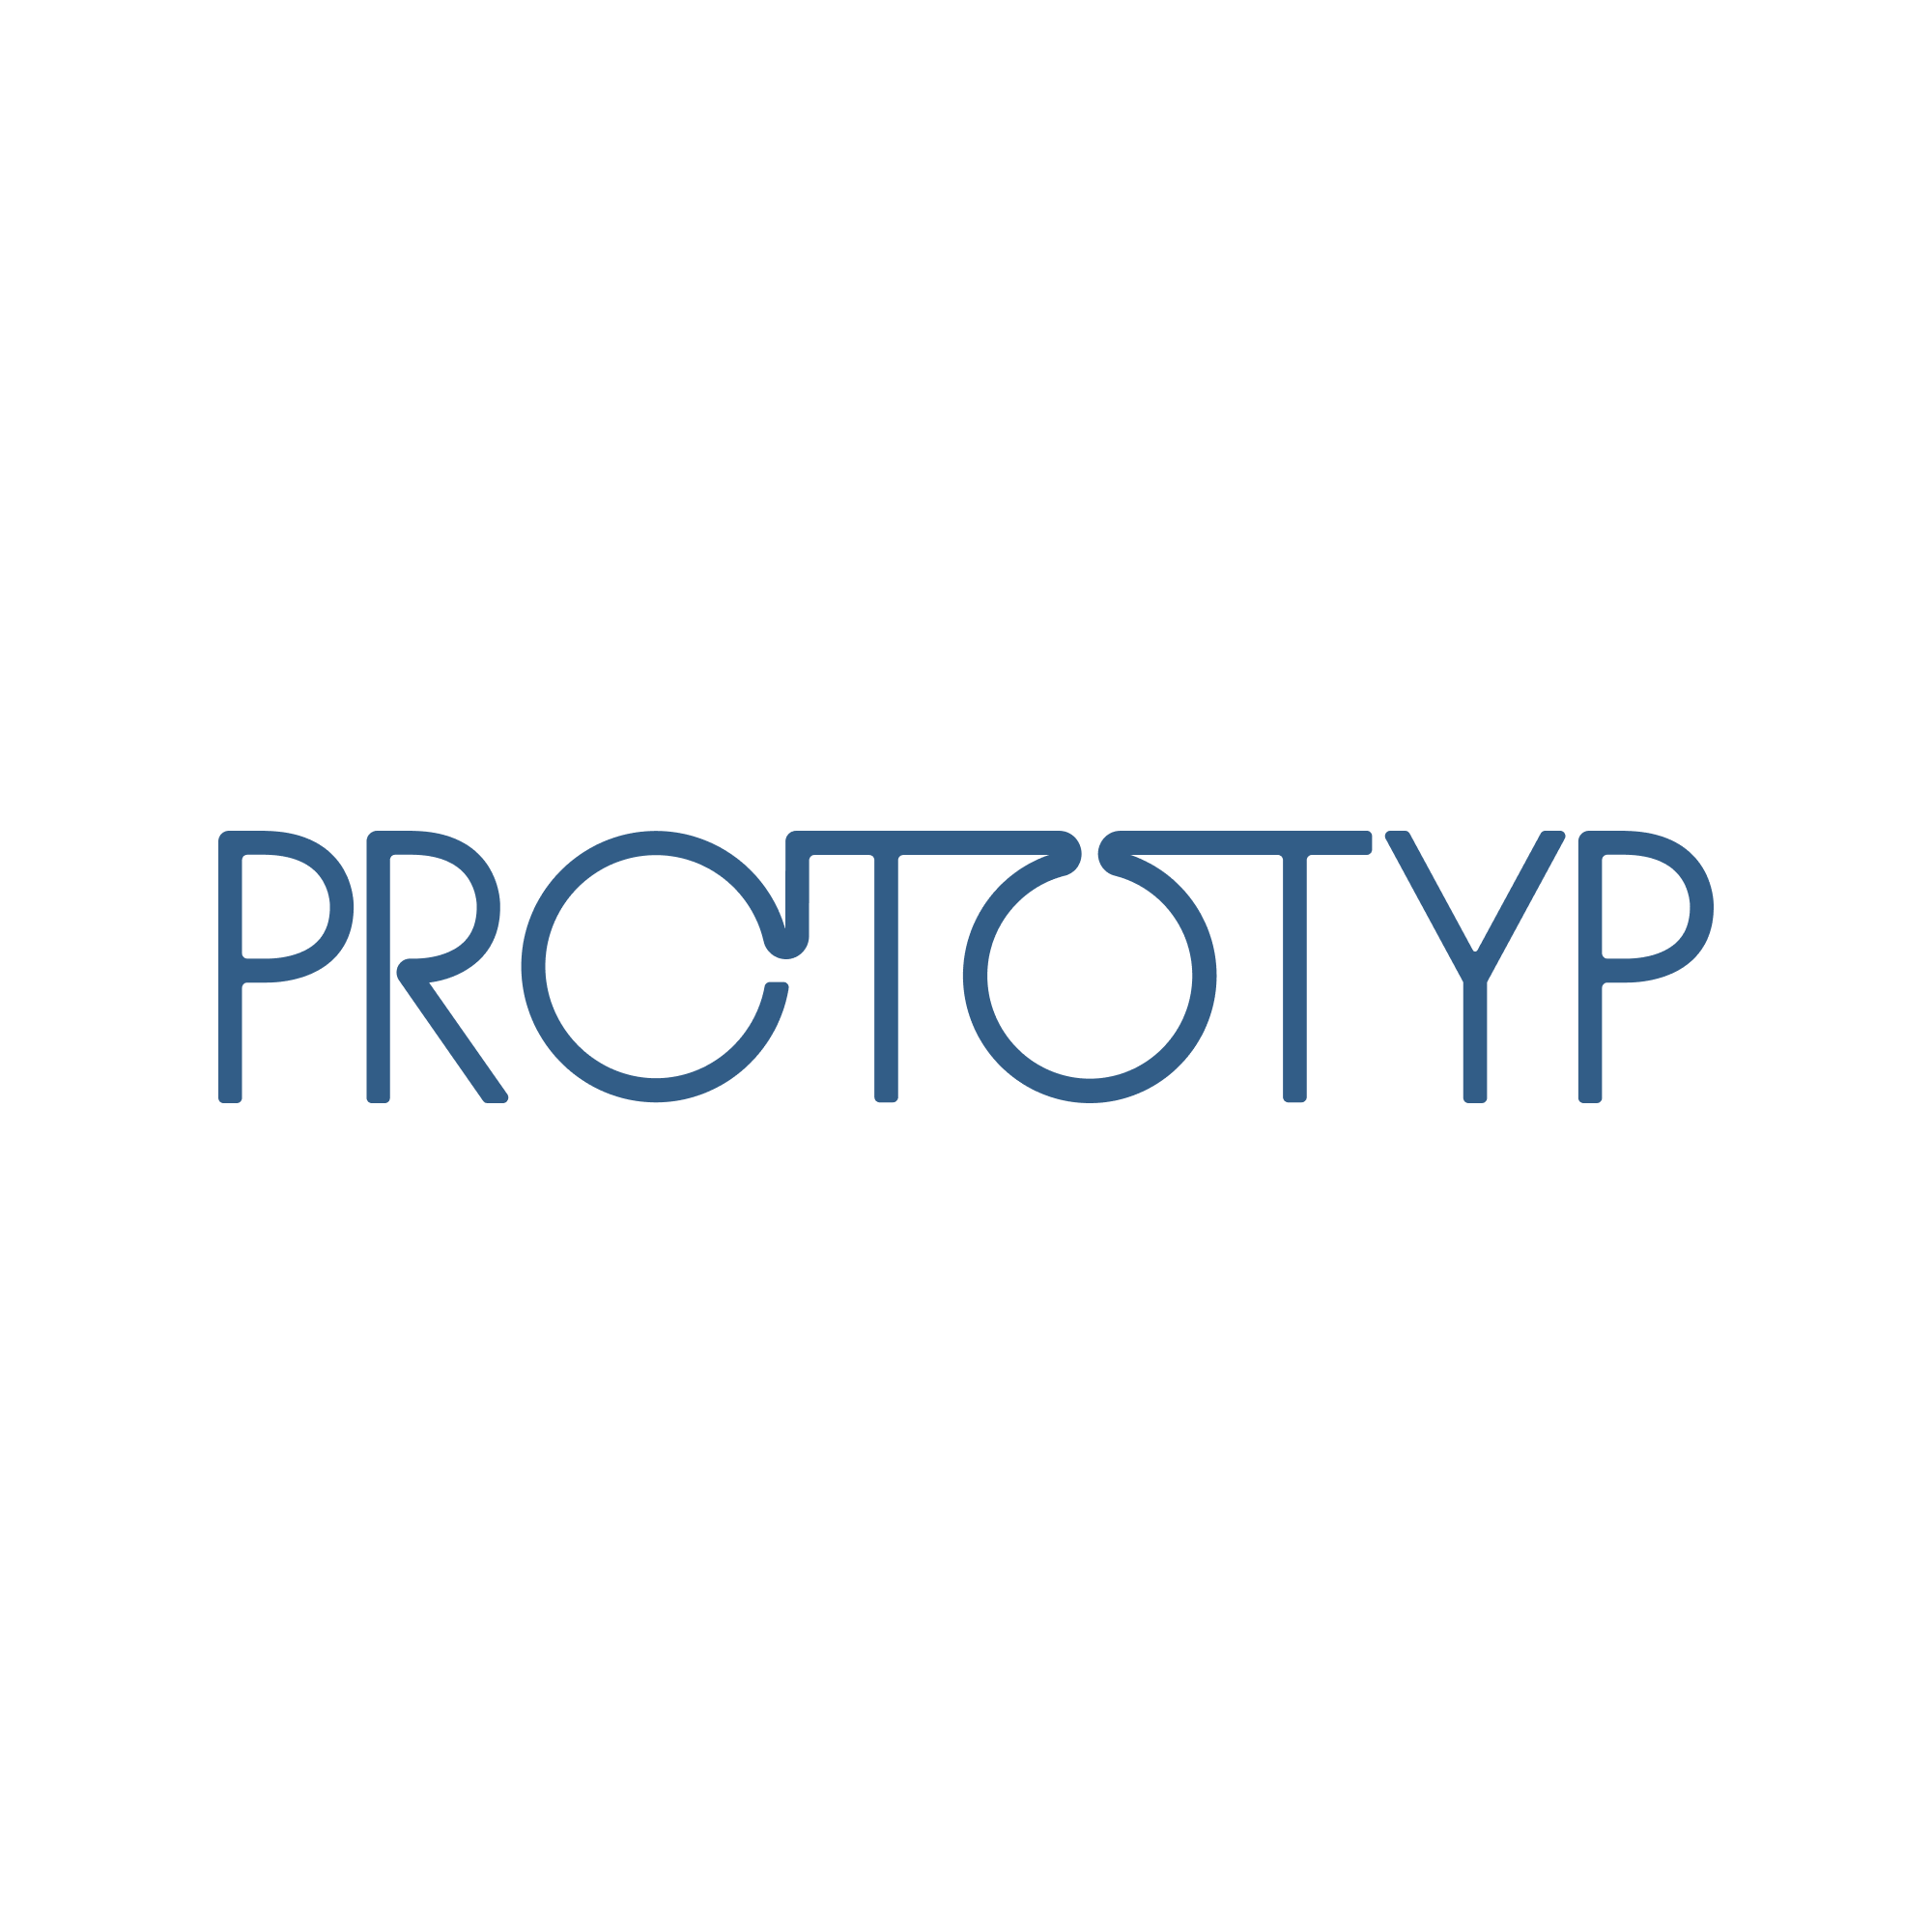 Prototyp logo